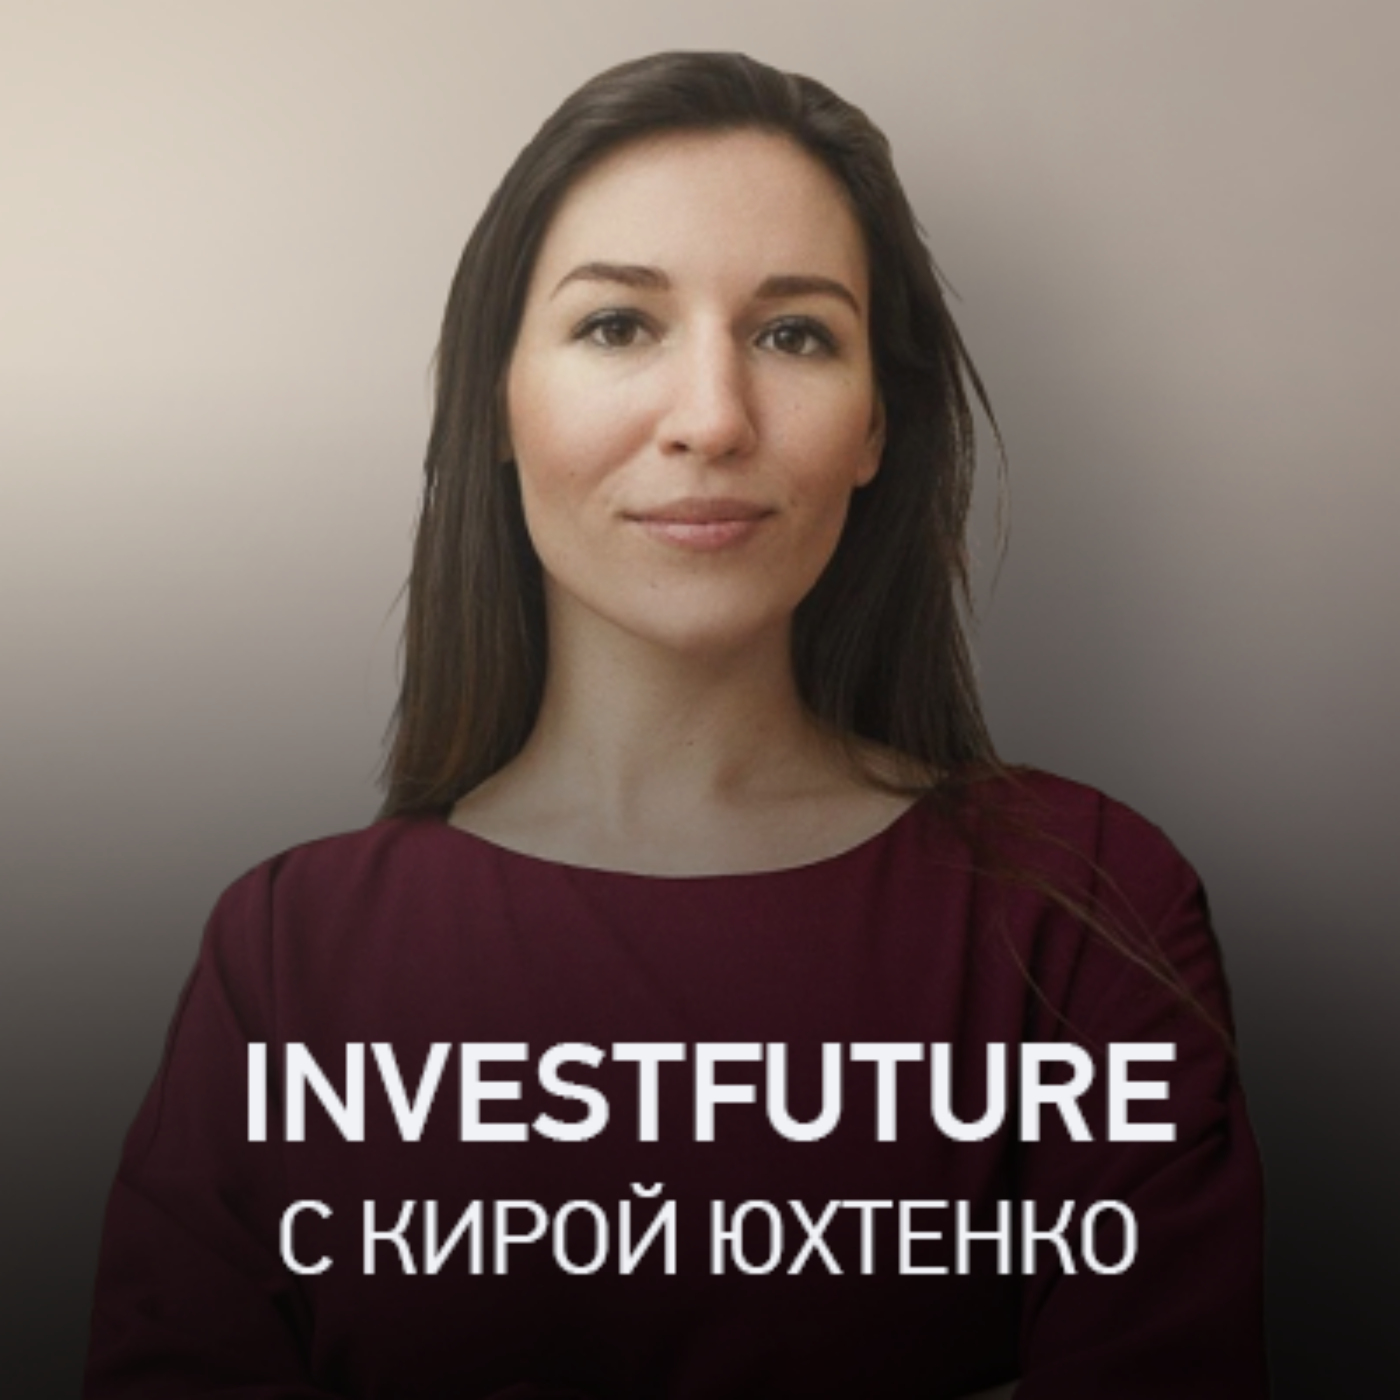 Radio Record InvestFuture (23-07-2021)